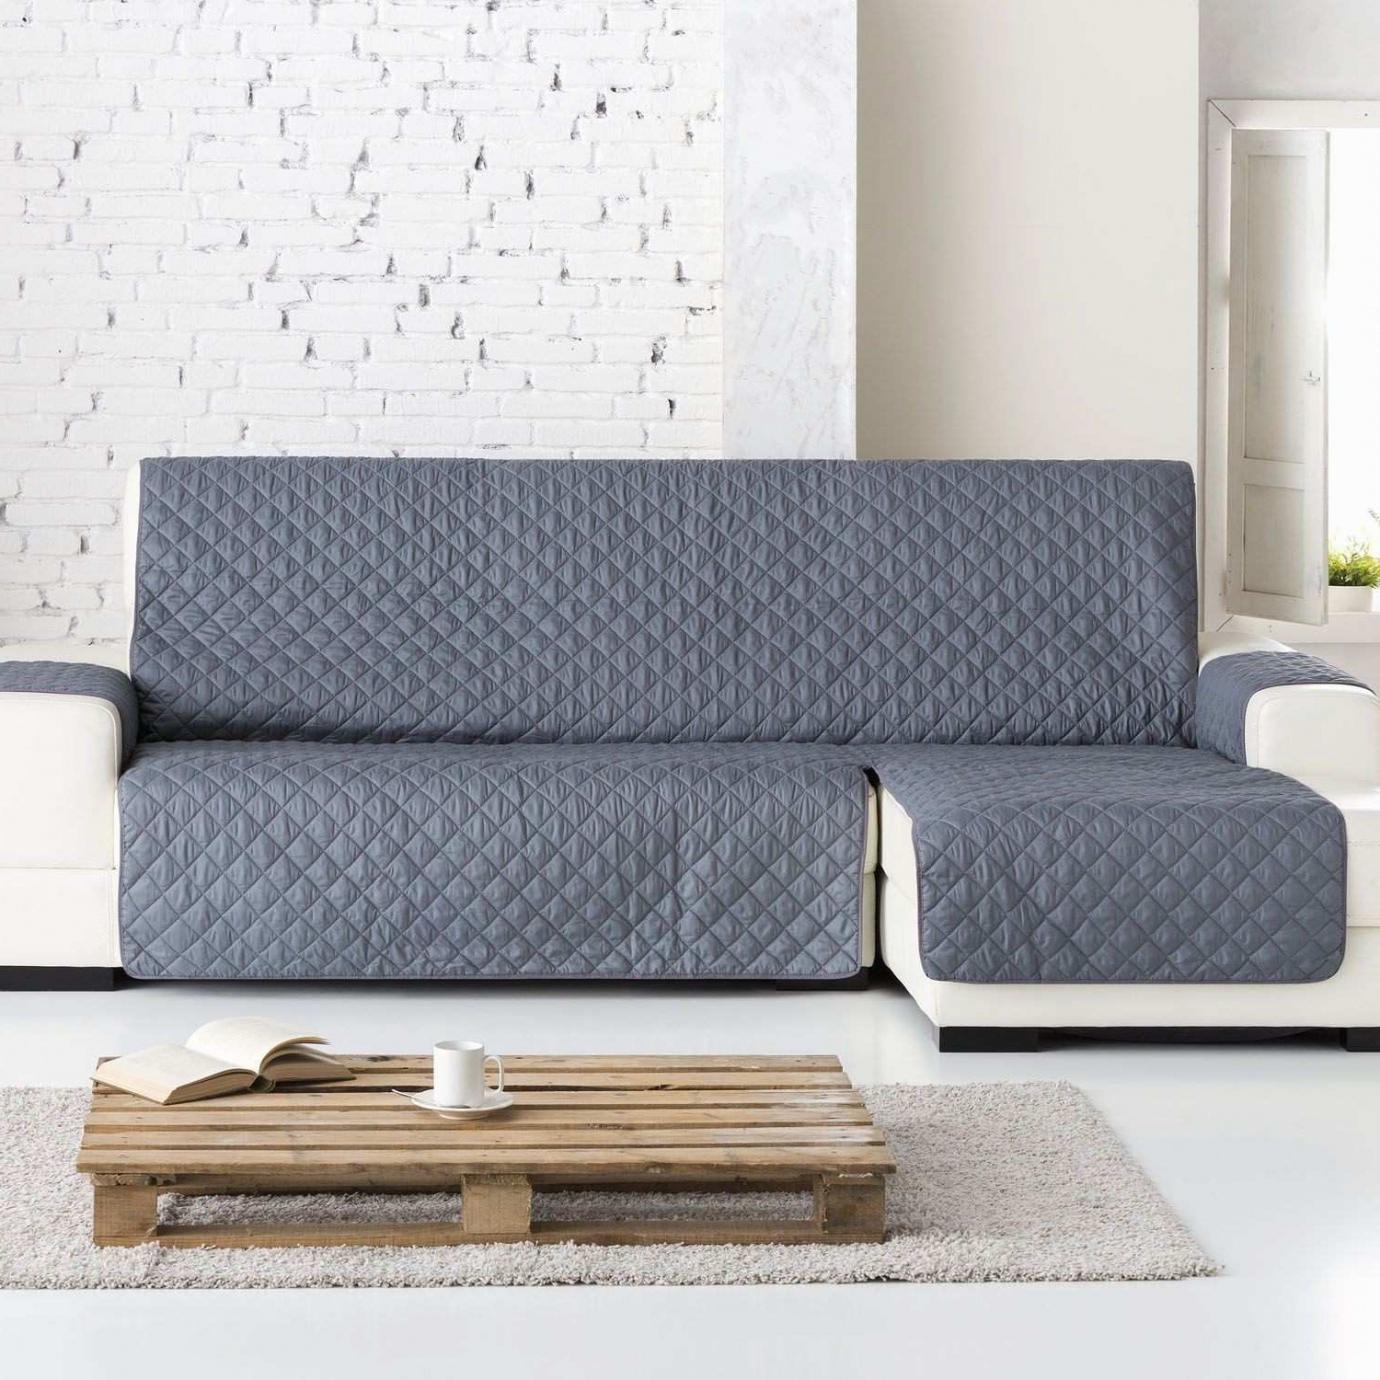 El Corte Ingles Fundas sofa 0gdr 39 Impresionante Fundas Ajustables Para sofas Fiesta De Lamusica